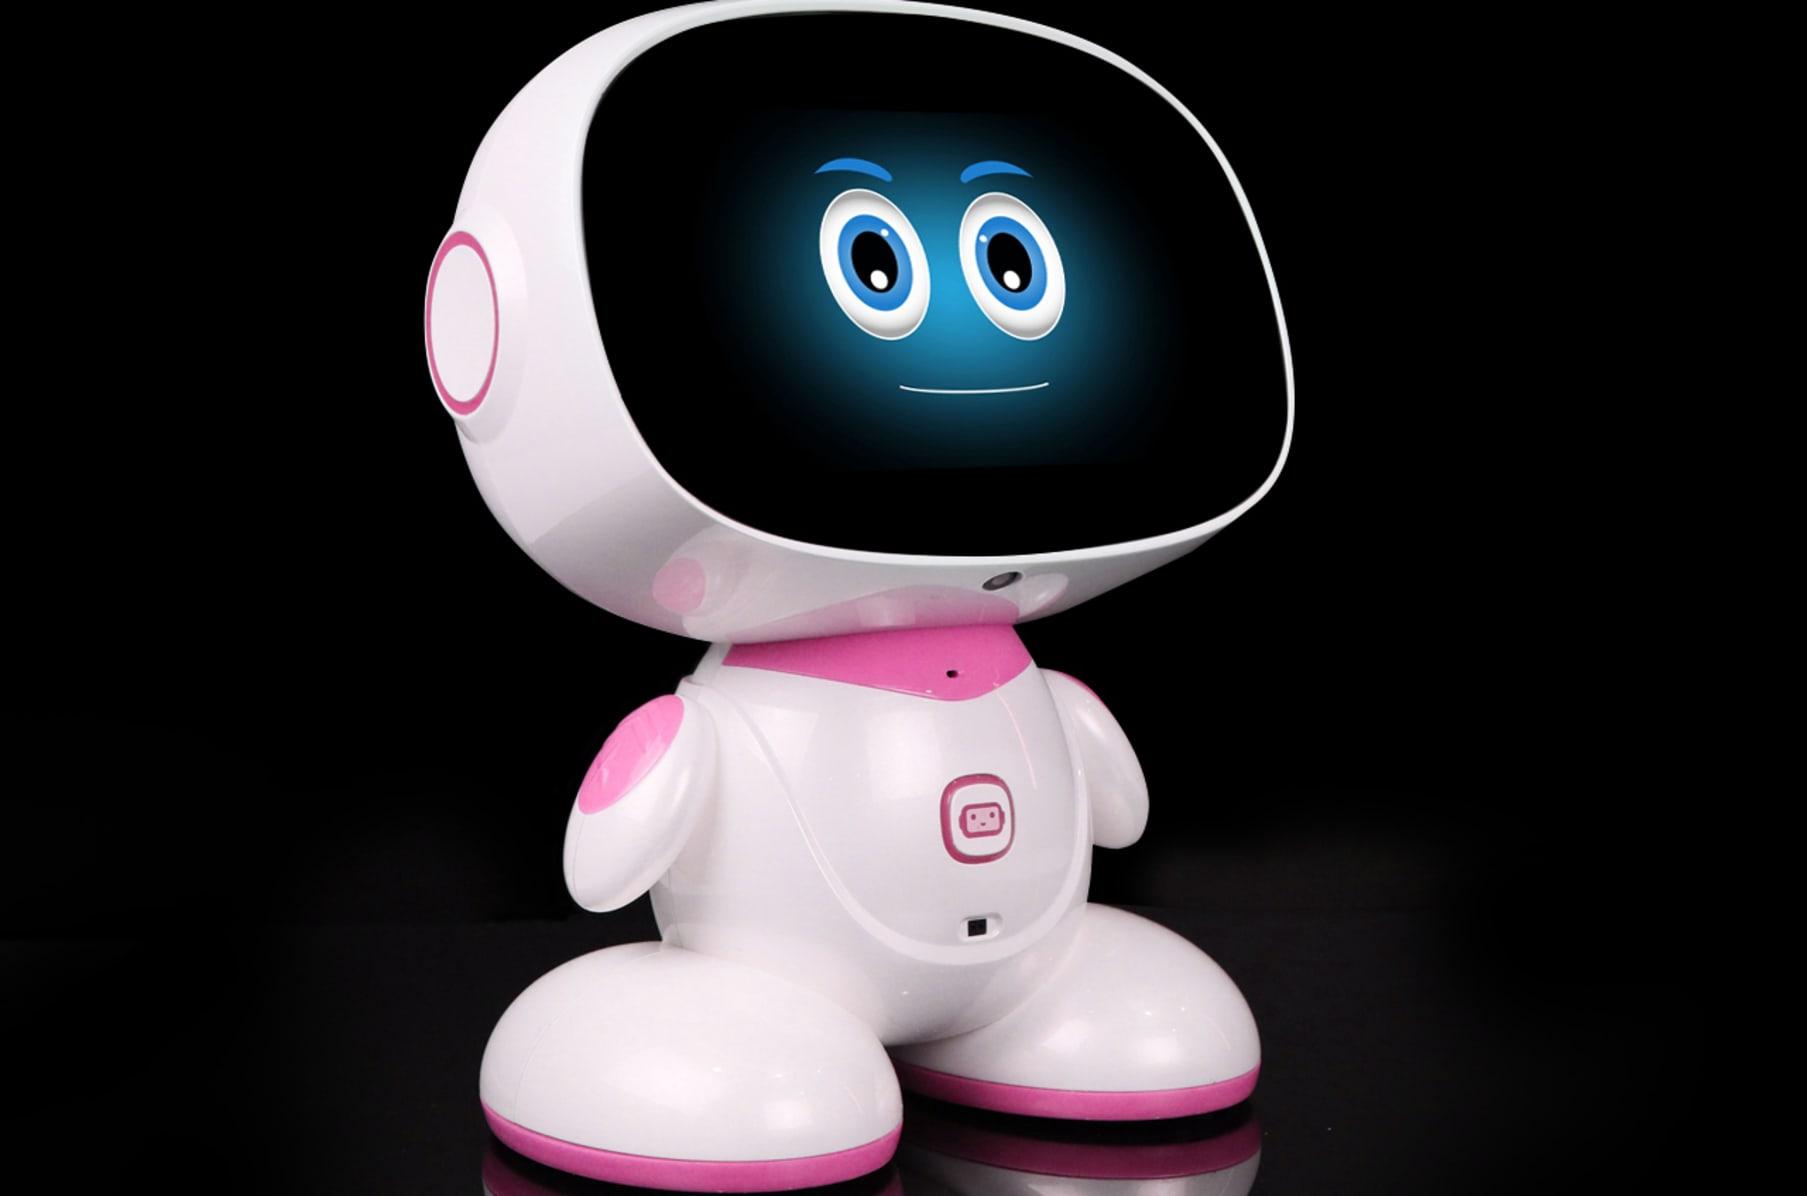 Misa Robot – Next Generation Social Robot